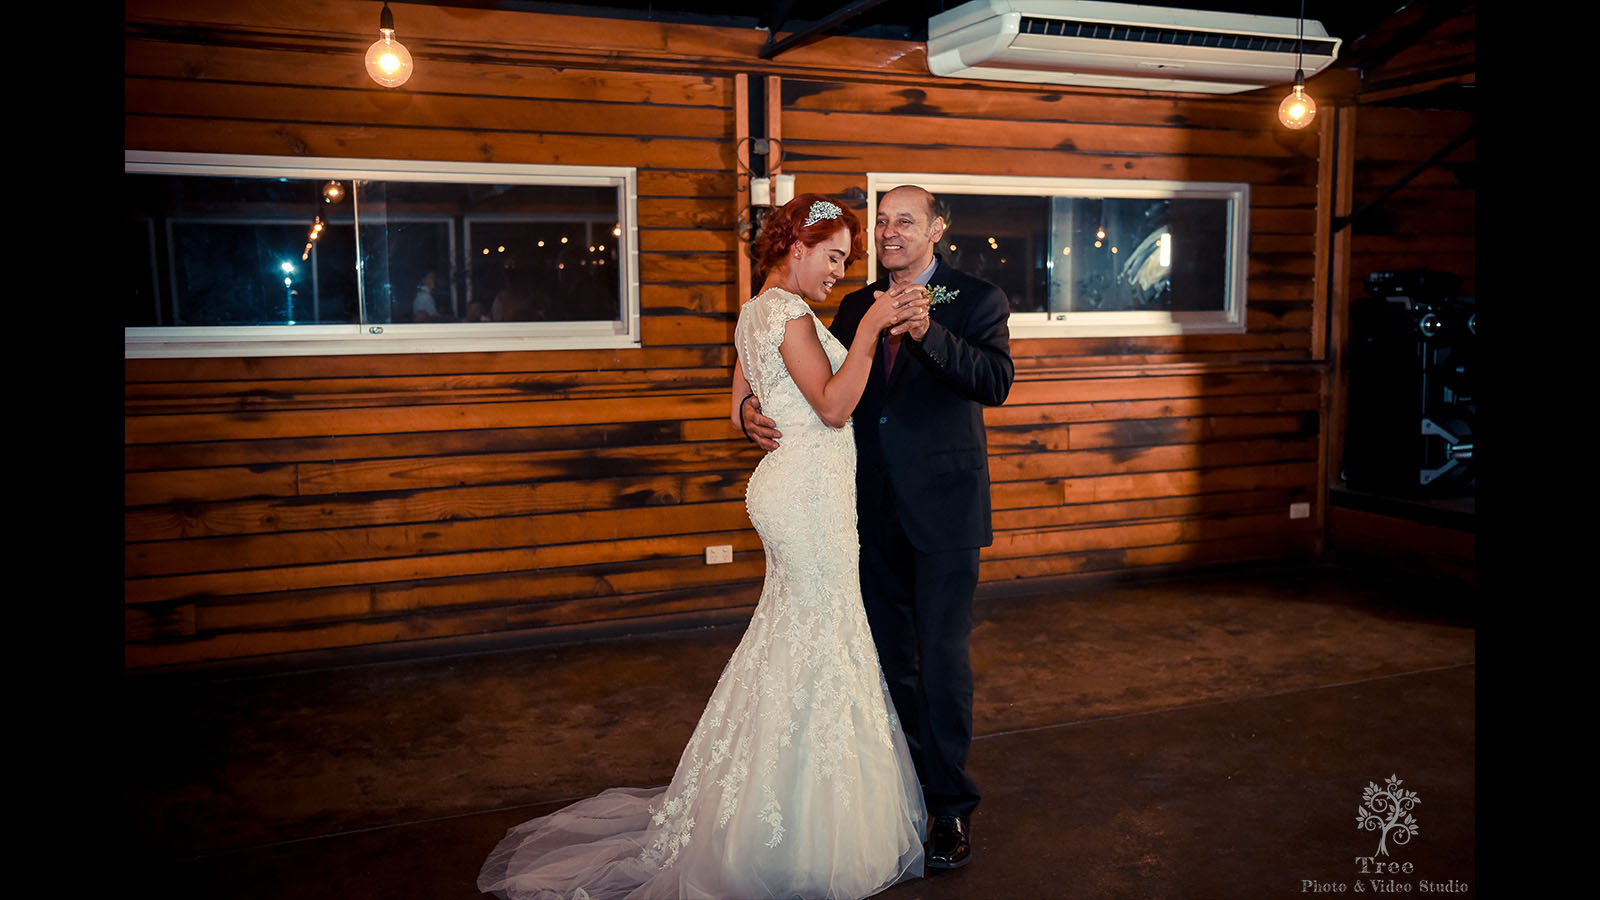 Zonzo Wedding Dancing 4